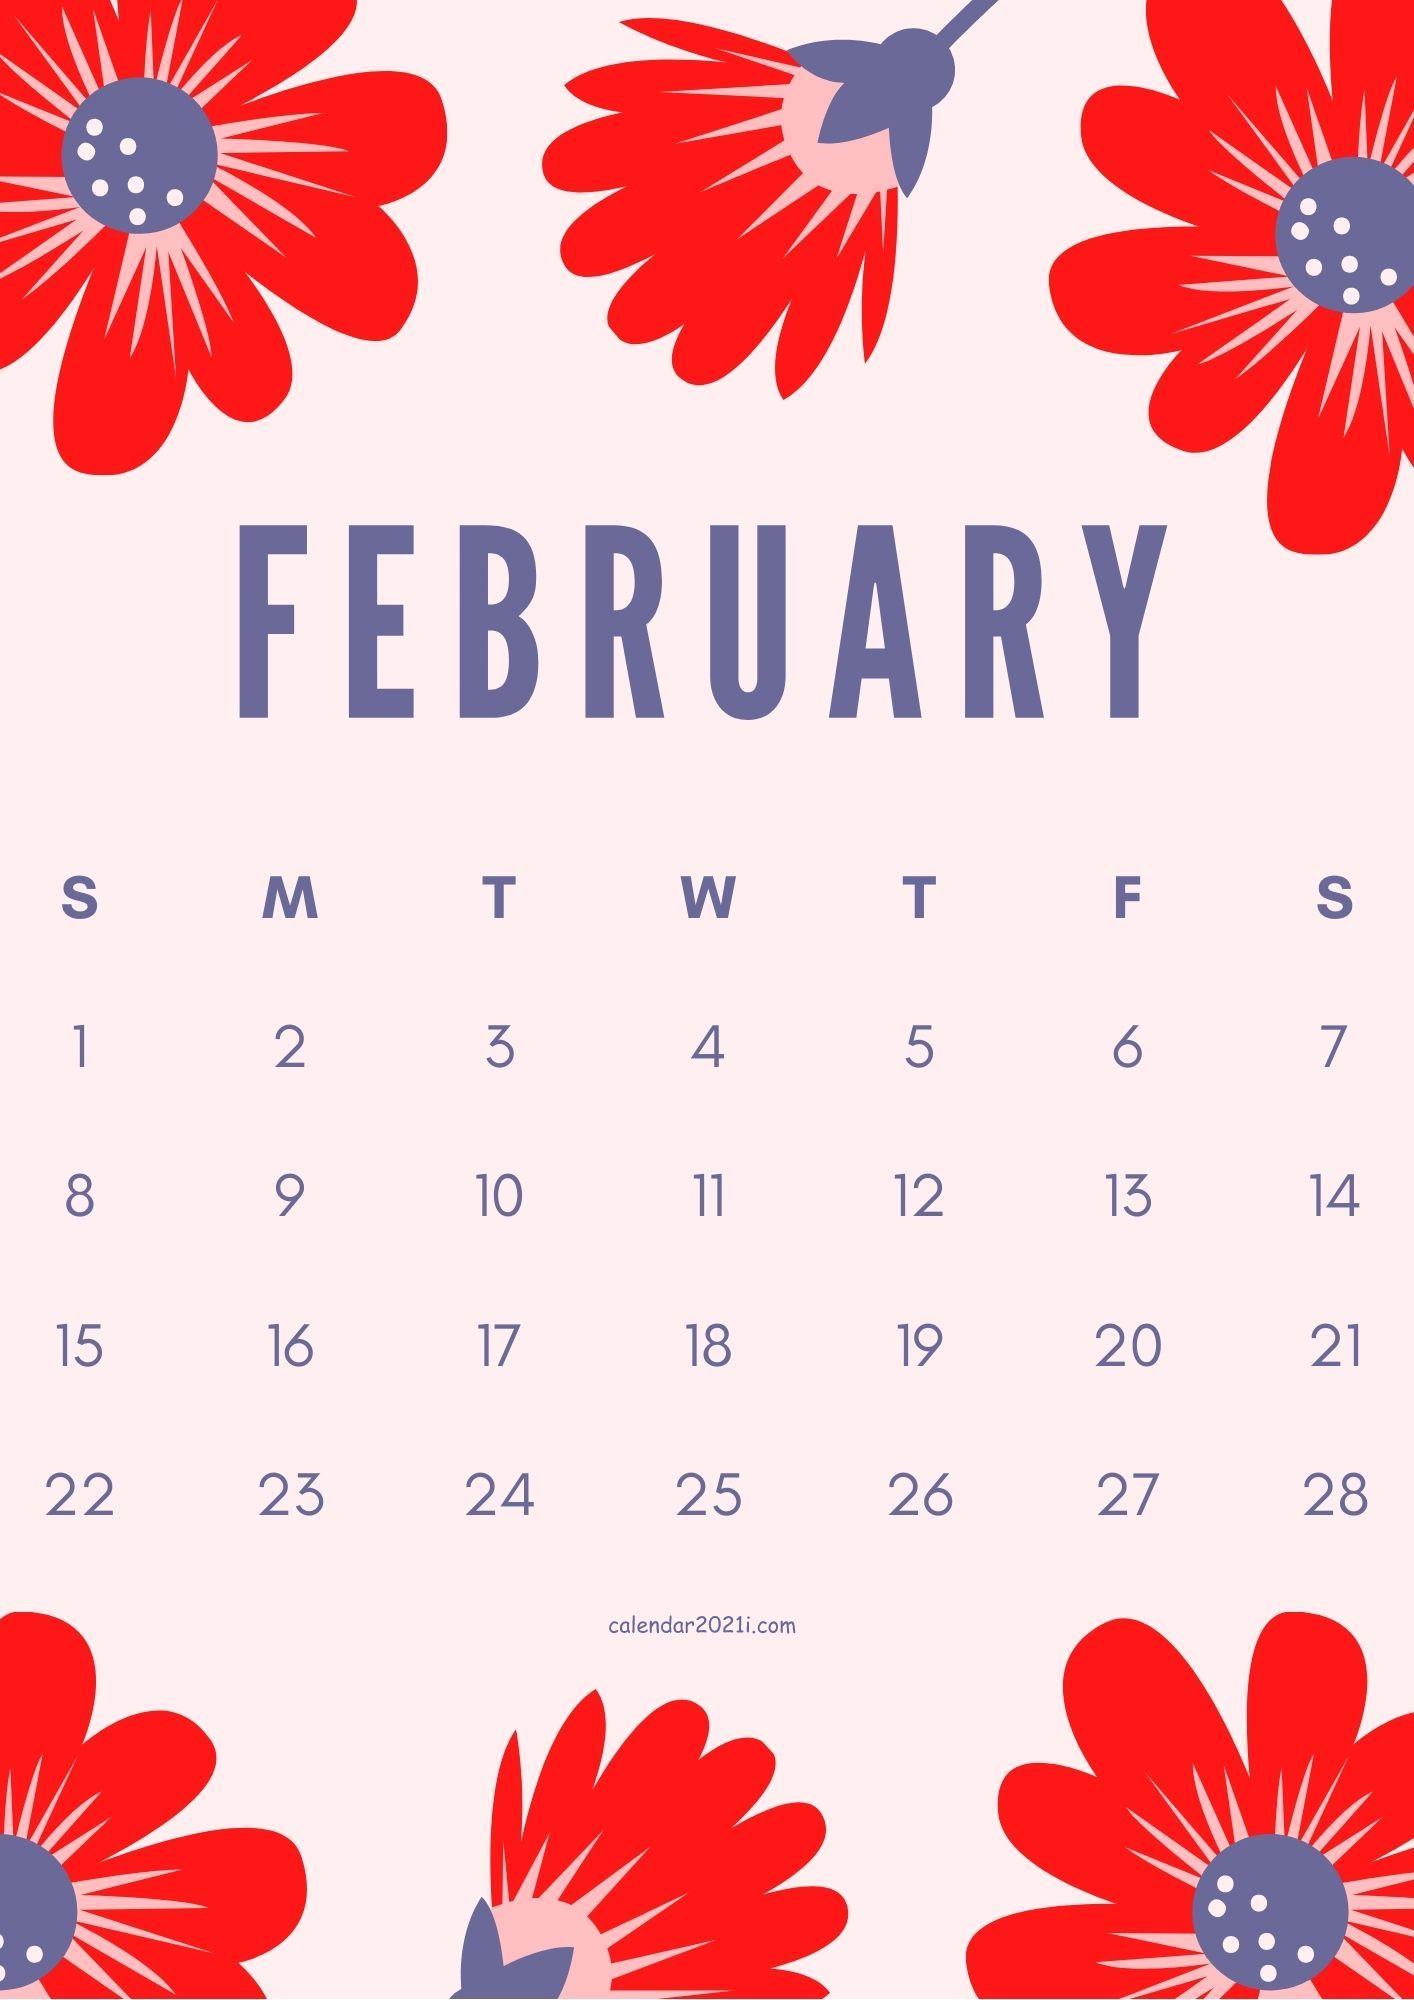 February 2021 Flower Calendar Download